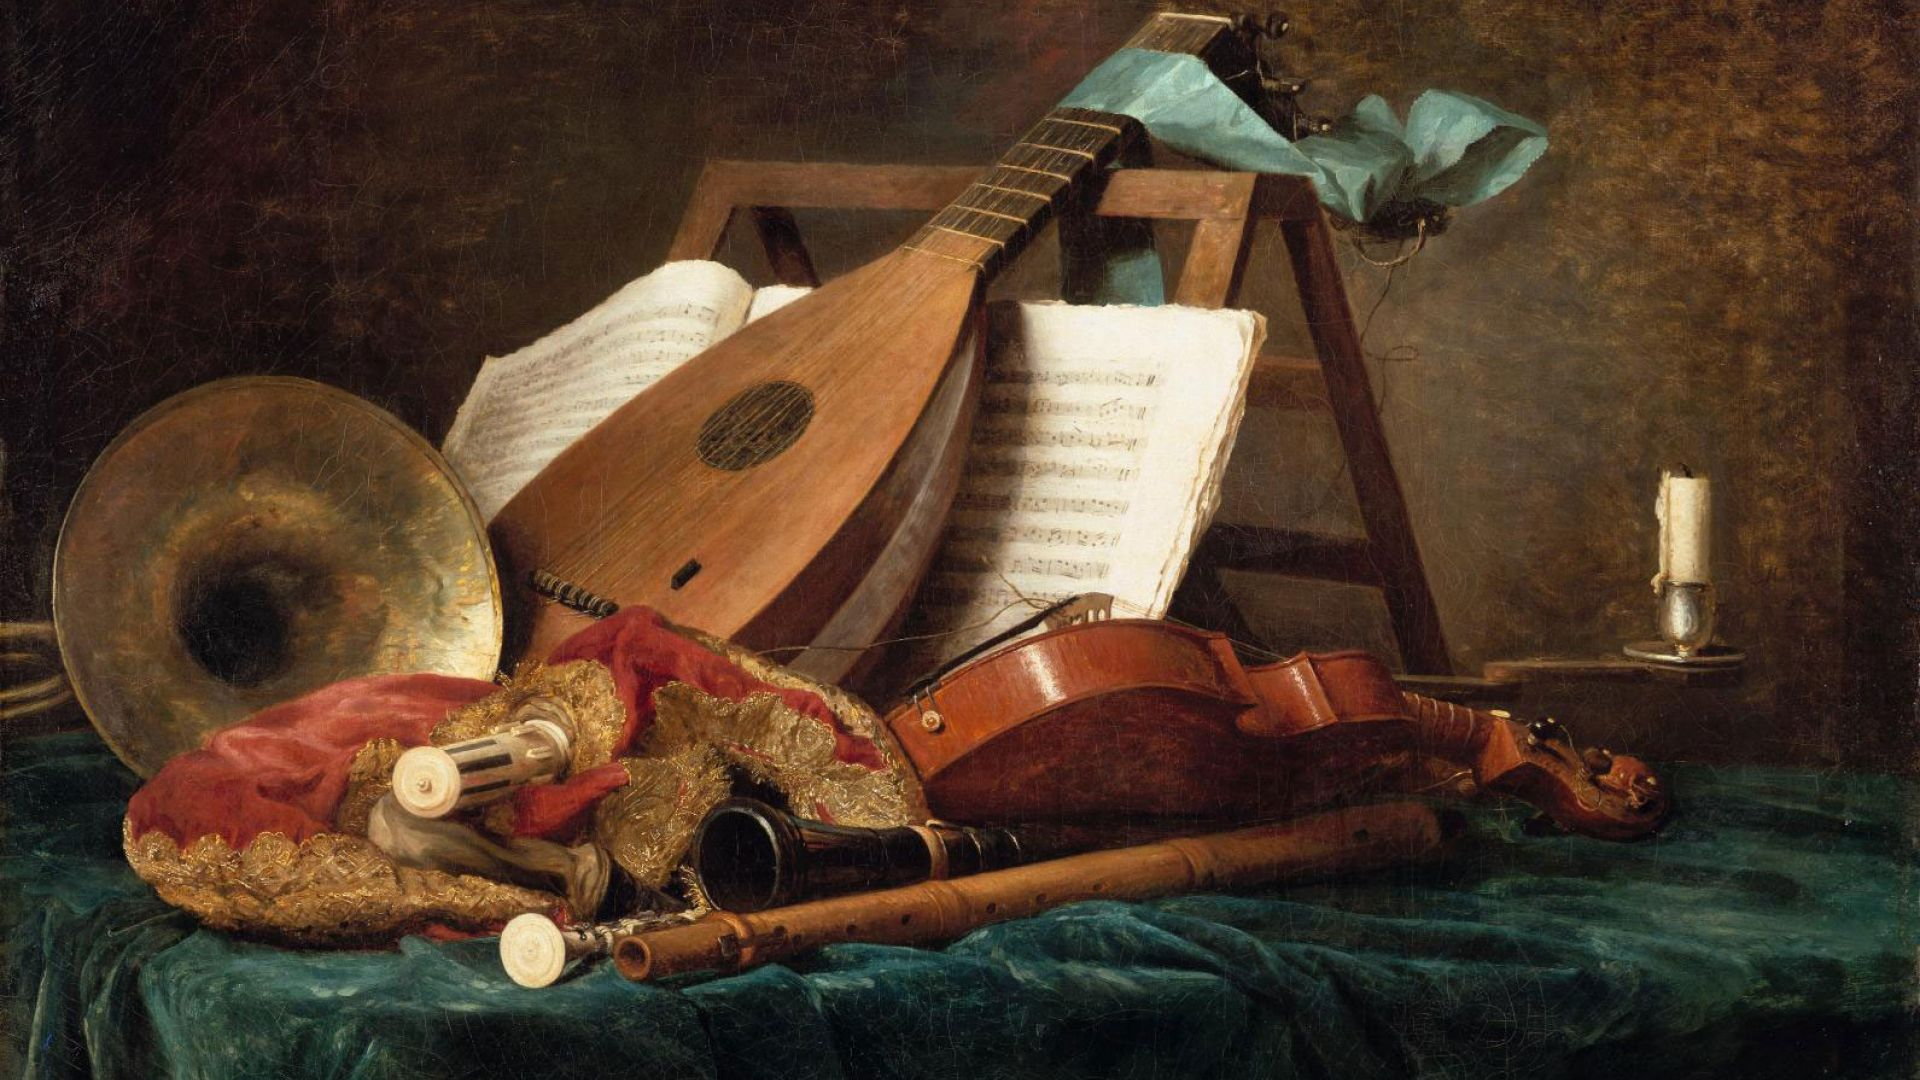 Les attributs de la musique, Anne Vallayer-Coster, 1770